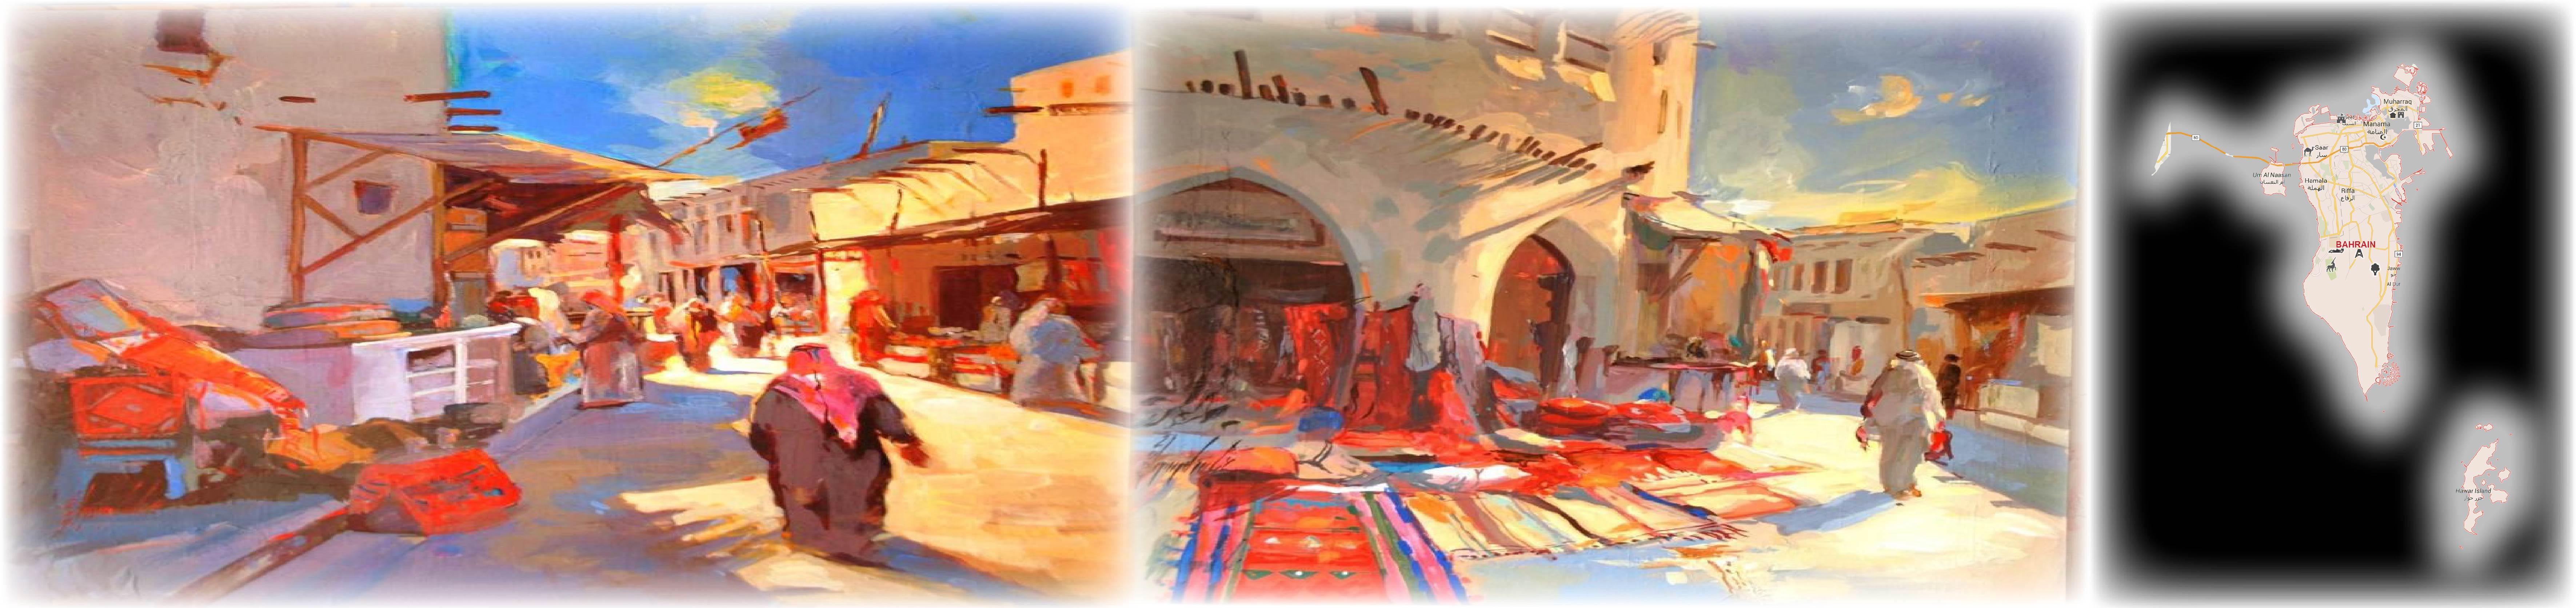 Dilmun Civilization: The ancient civilization of the Gulf